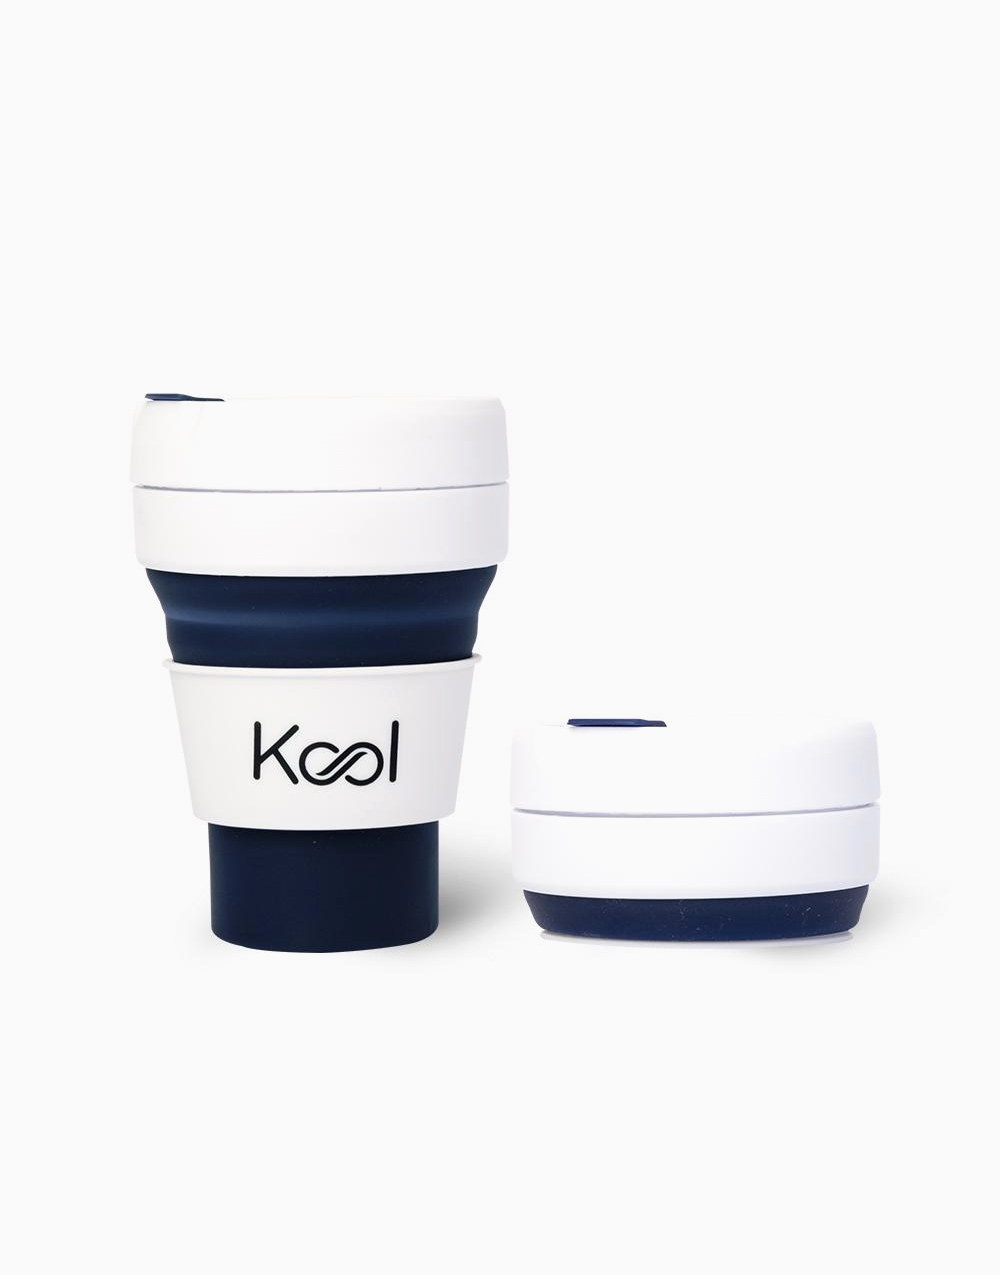 Kool Foldable Cup (355ml) by Kool   Cobalt